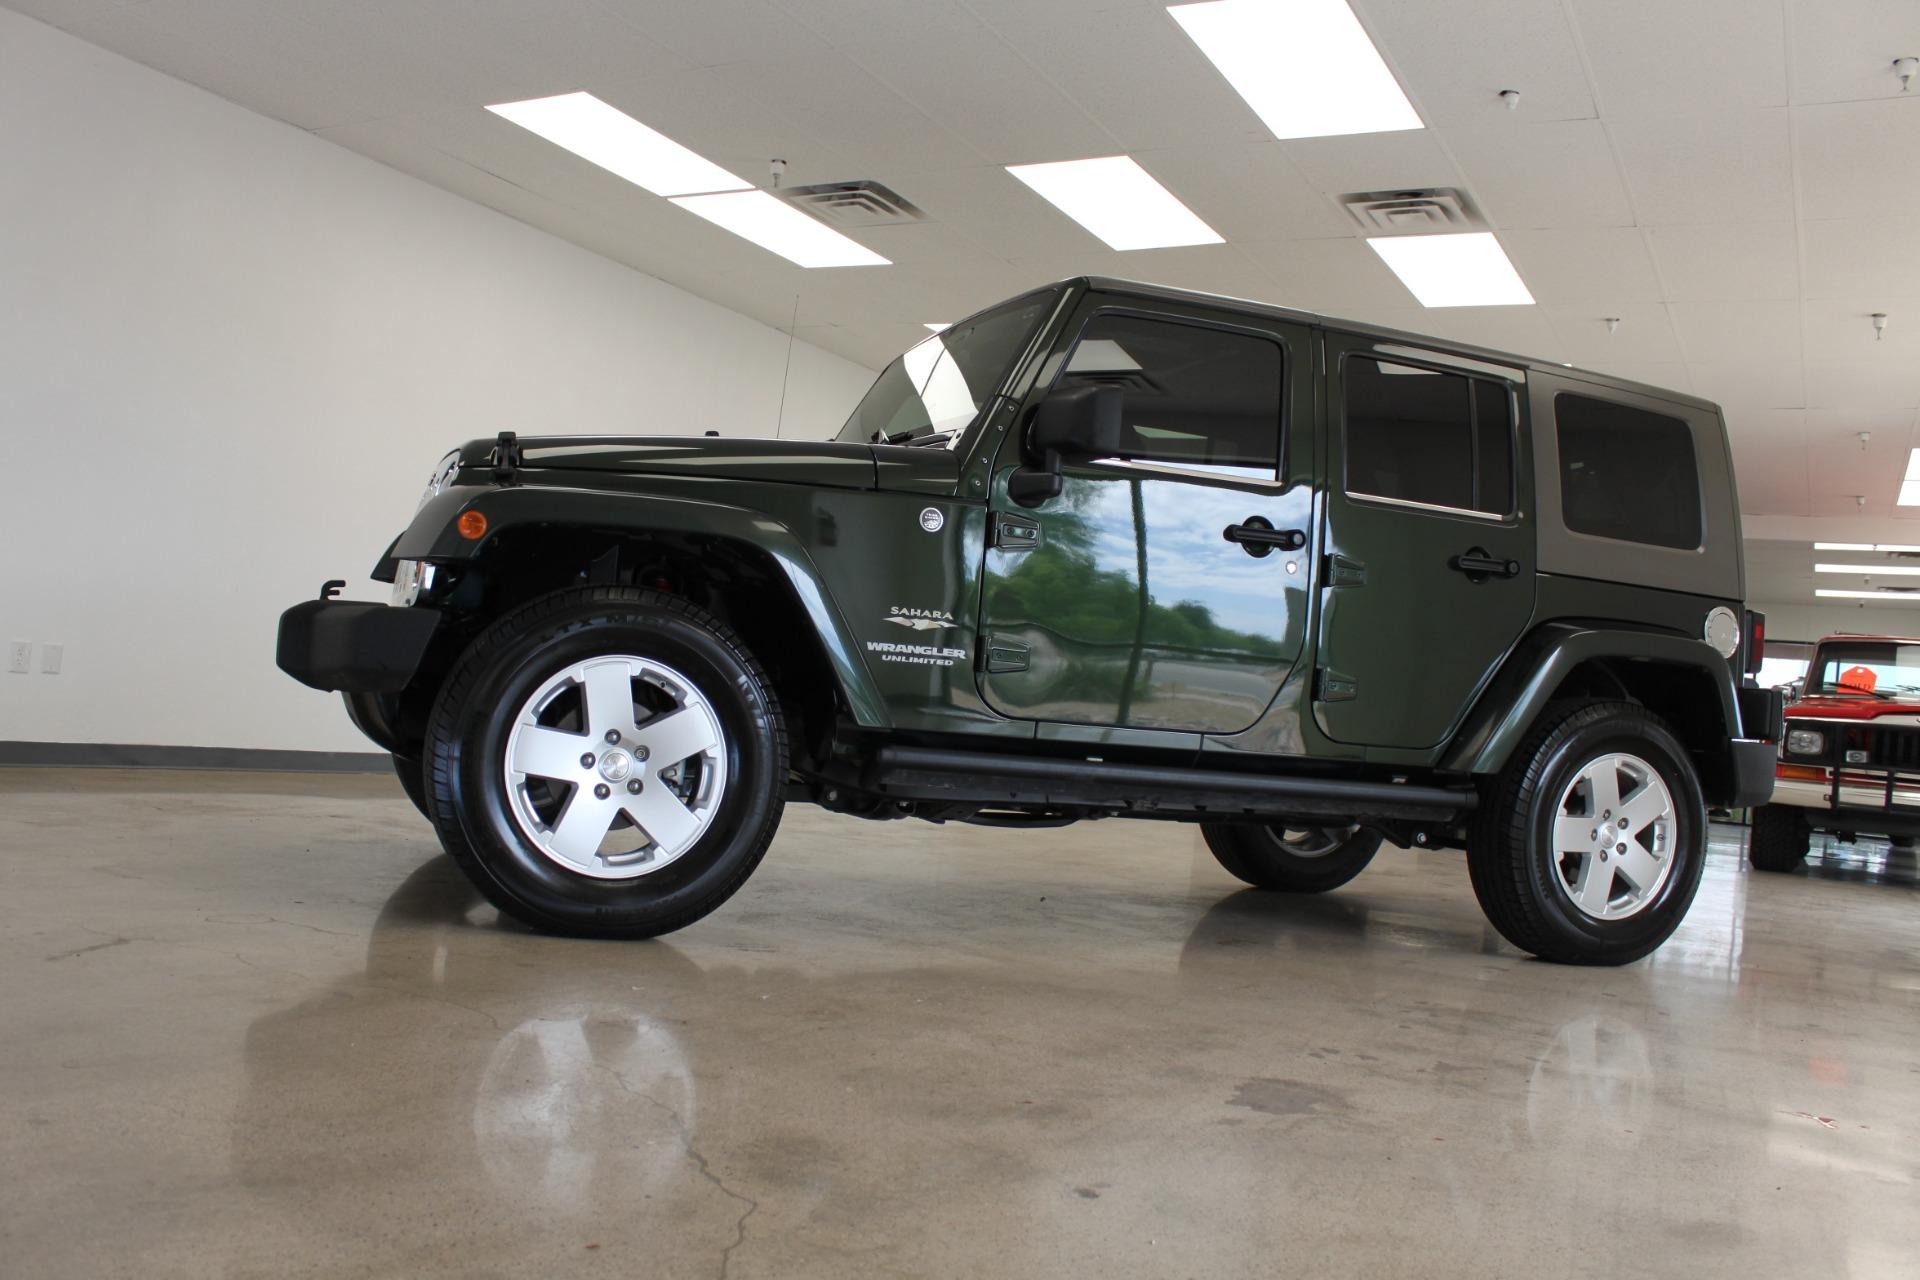 Used-2010-Jeep-Wrangler-Unlimited-Sahara-4X4-Camaro